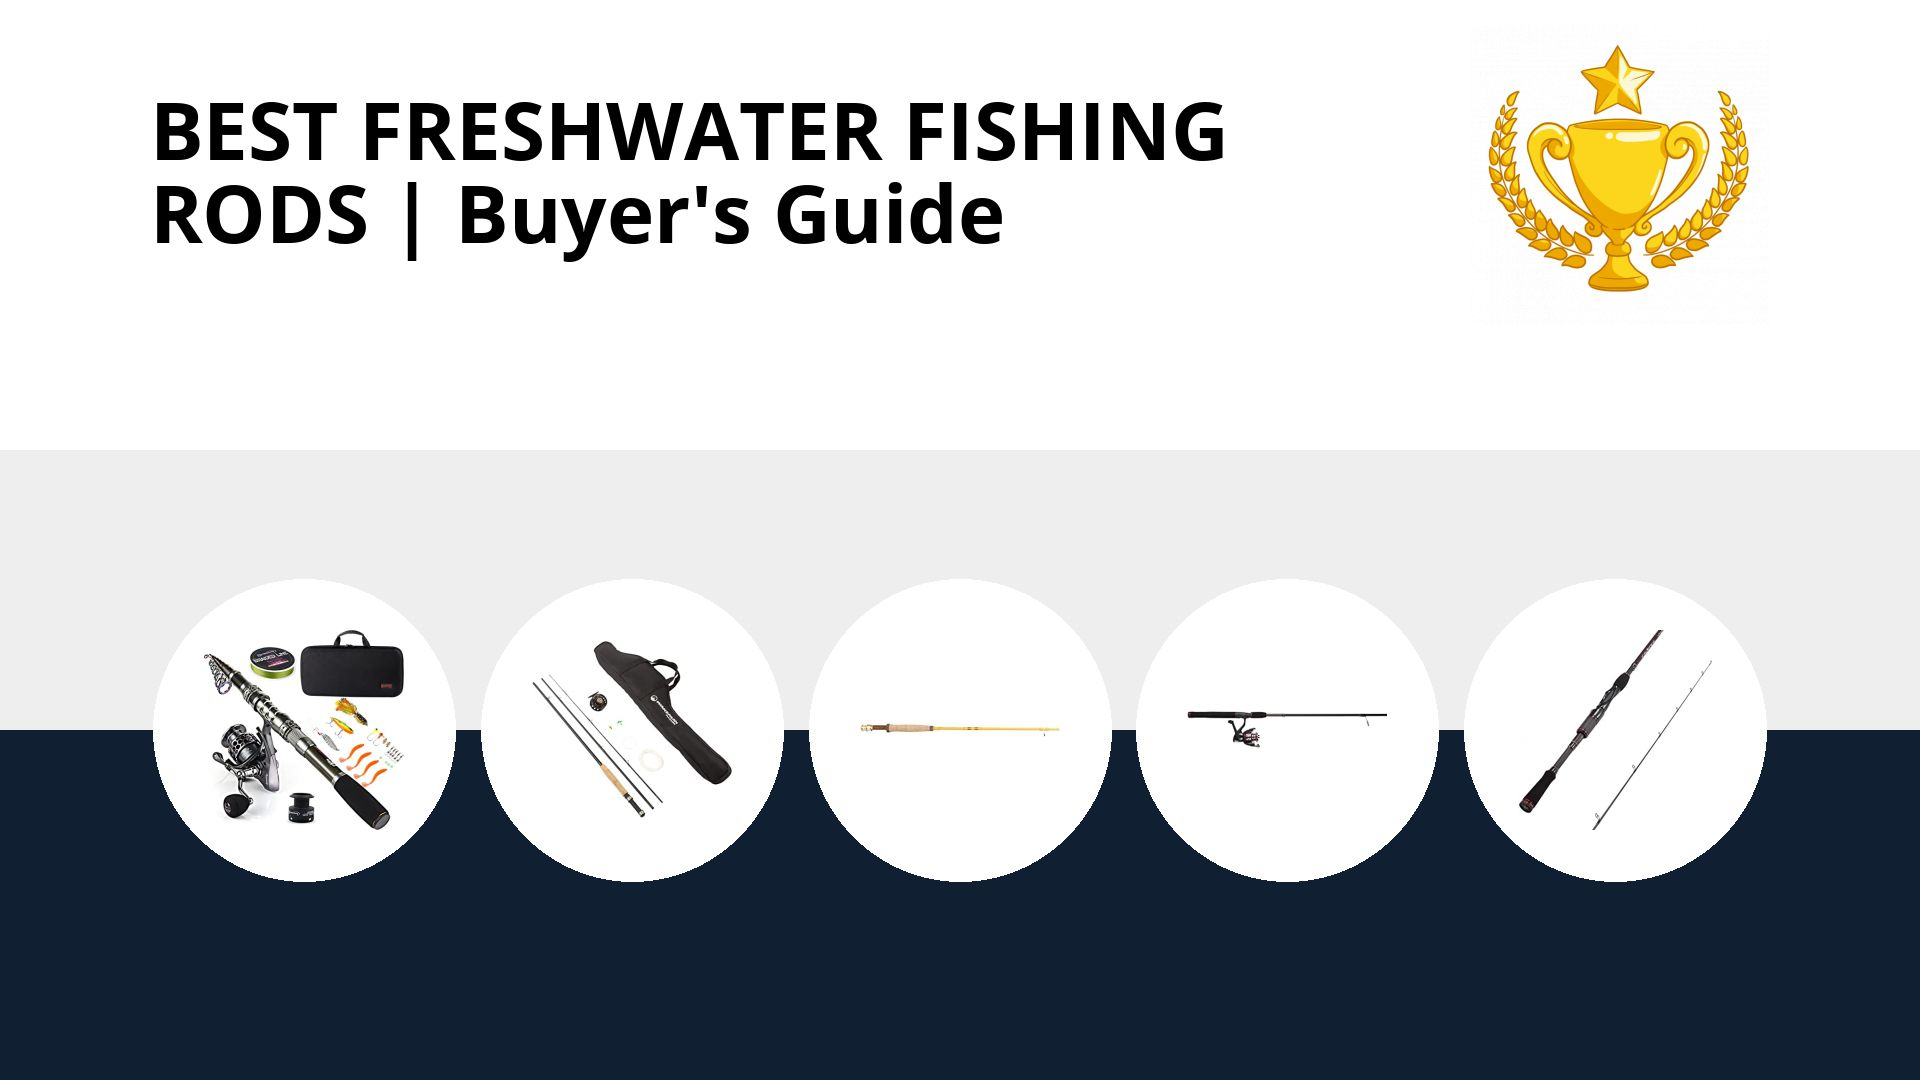 Best Freshwater Fishing Rods: image